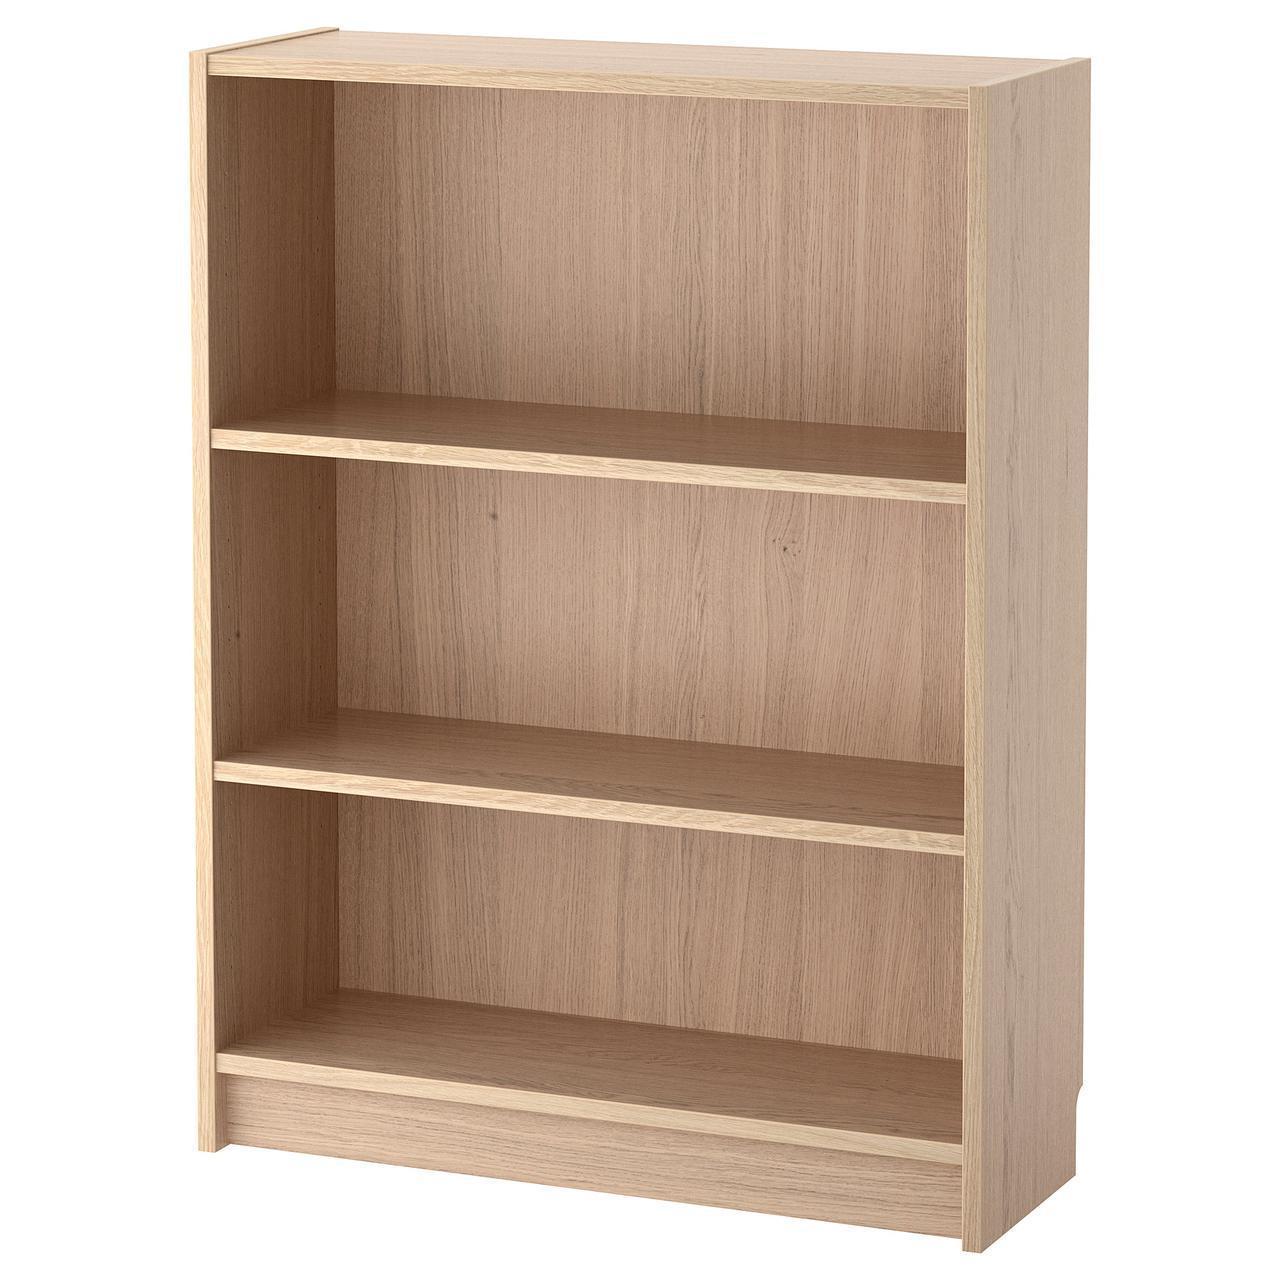 Стеллаж IKEA BILLY 80x28x106 см дубовый шпон 104.042.08